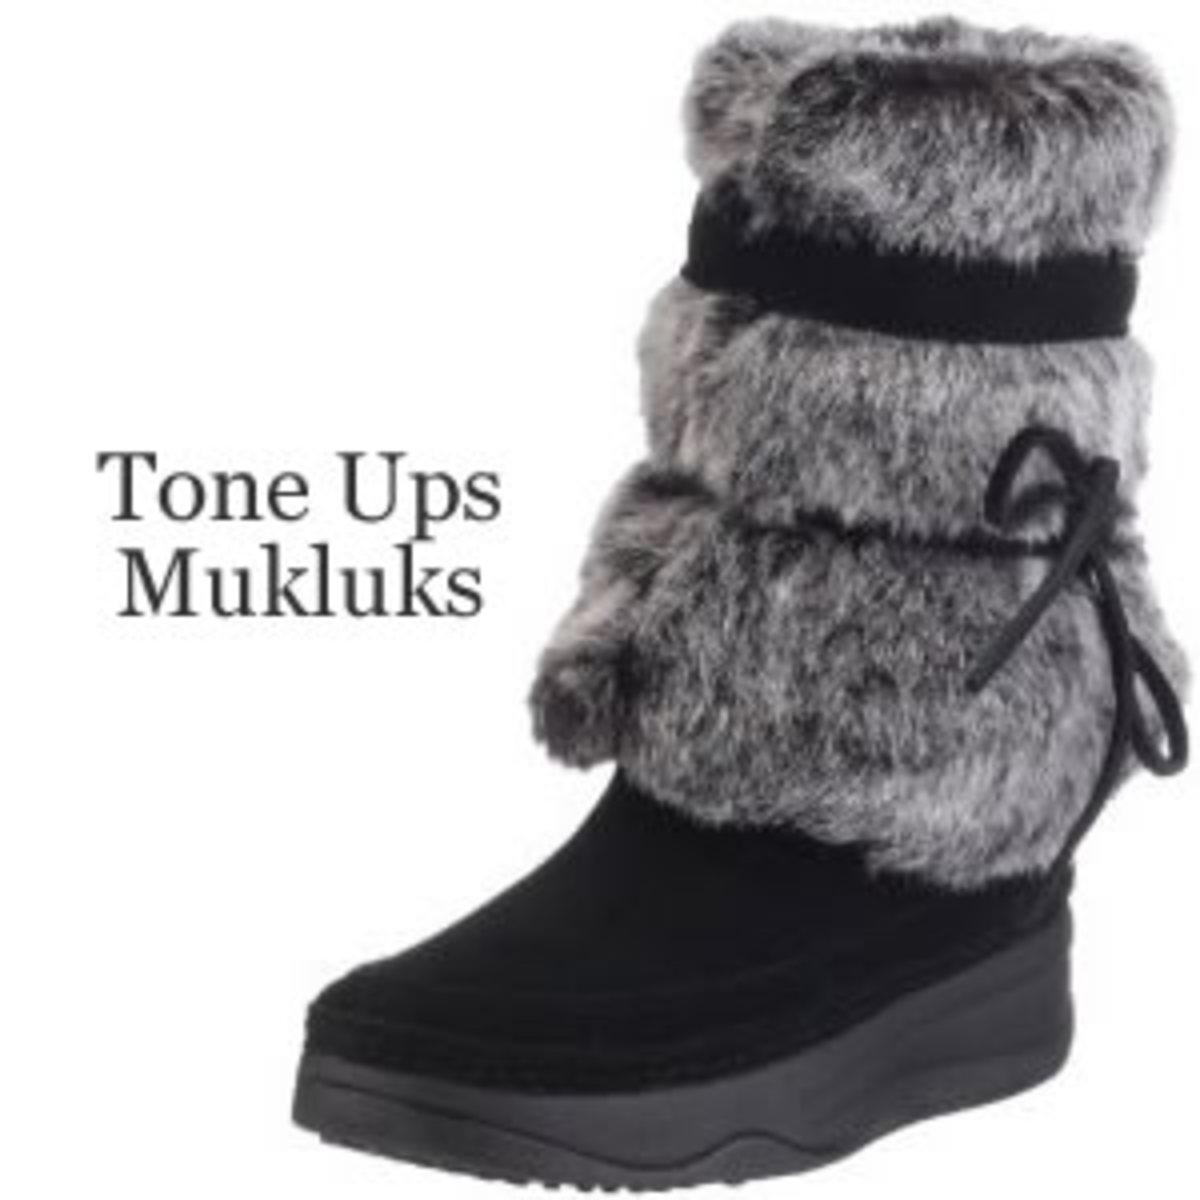 Skechers Tone Ups Mukluk Boots